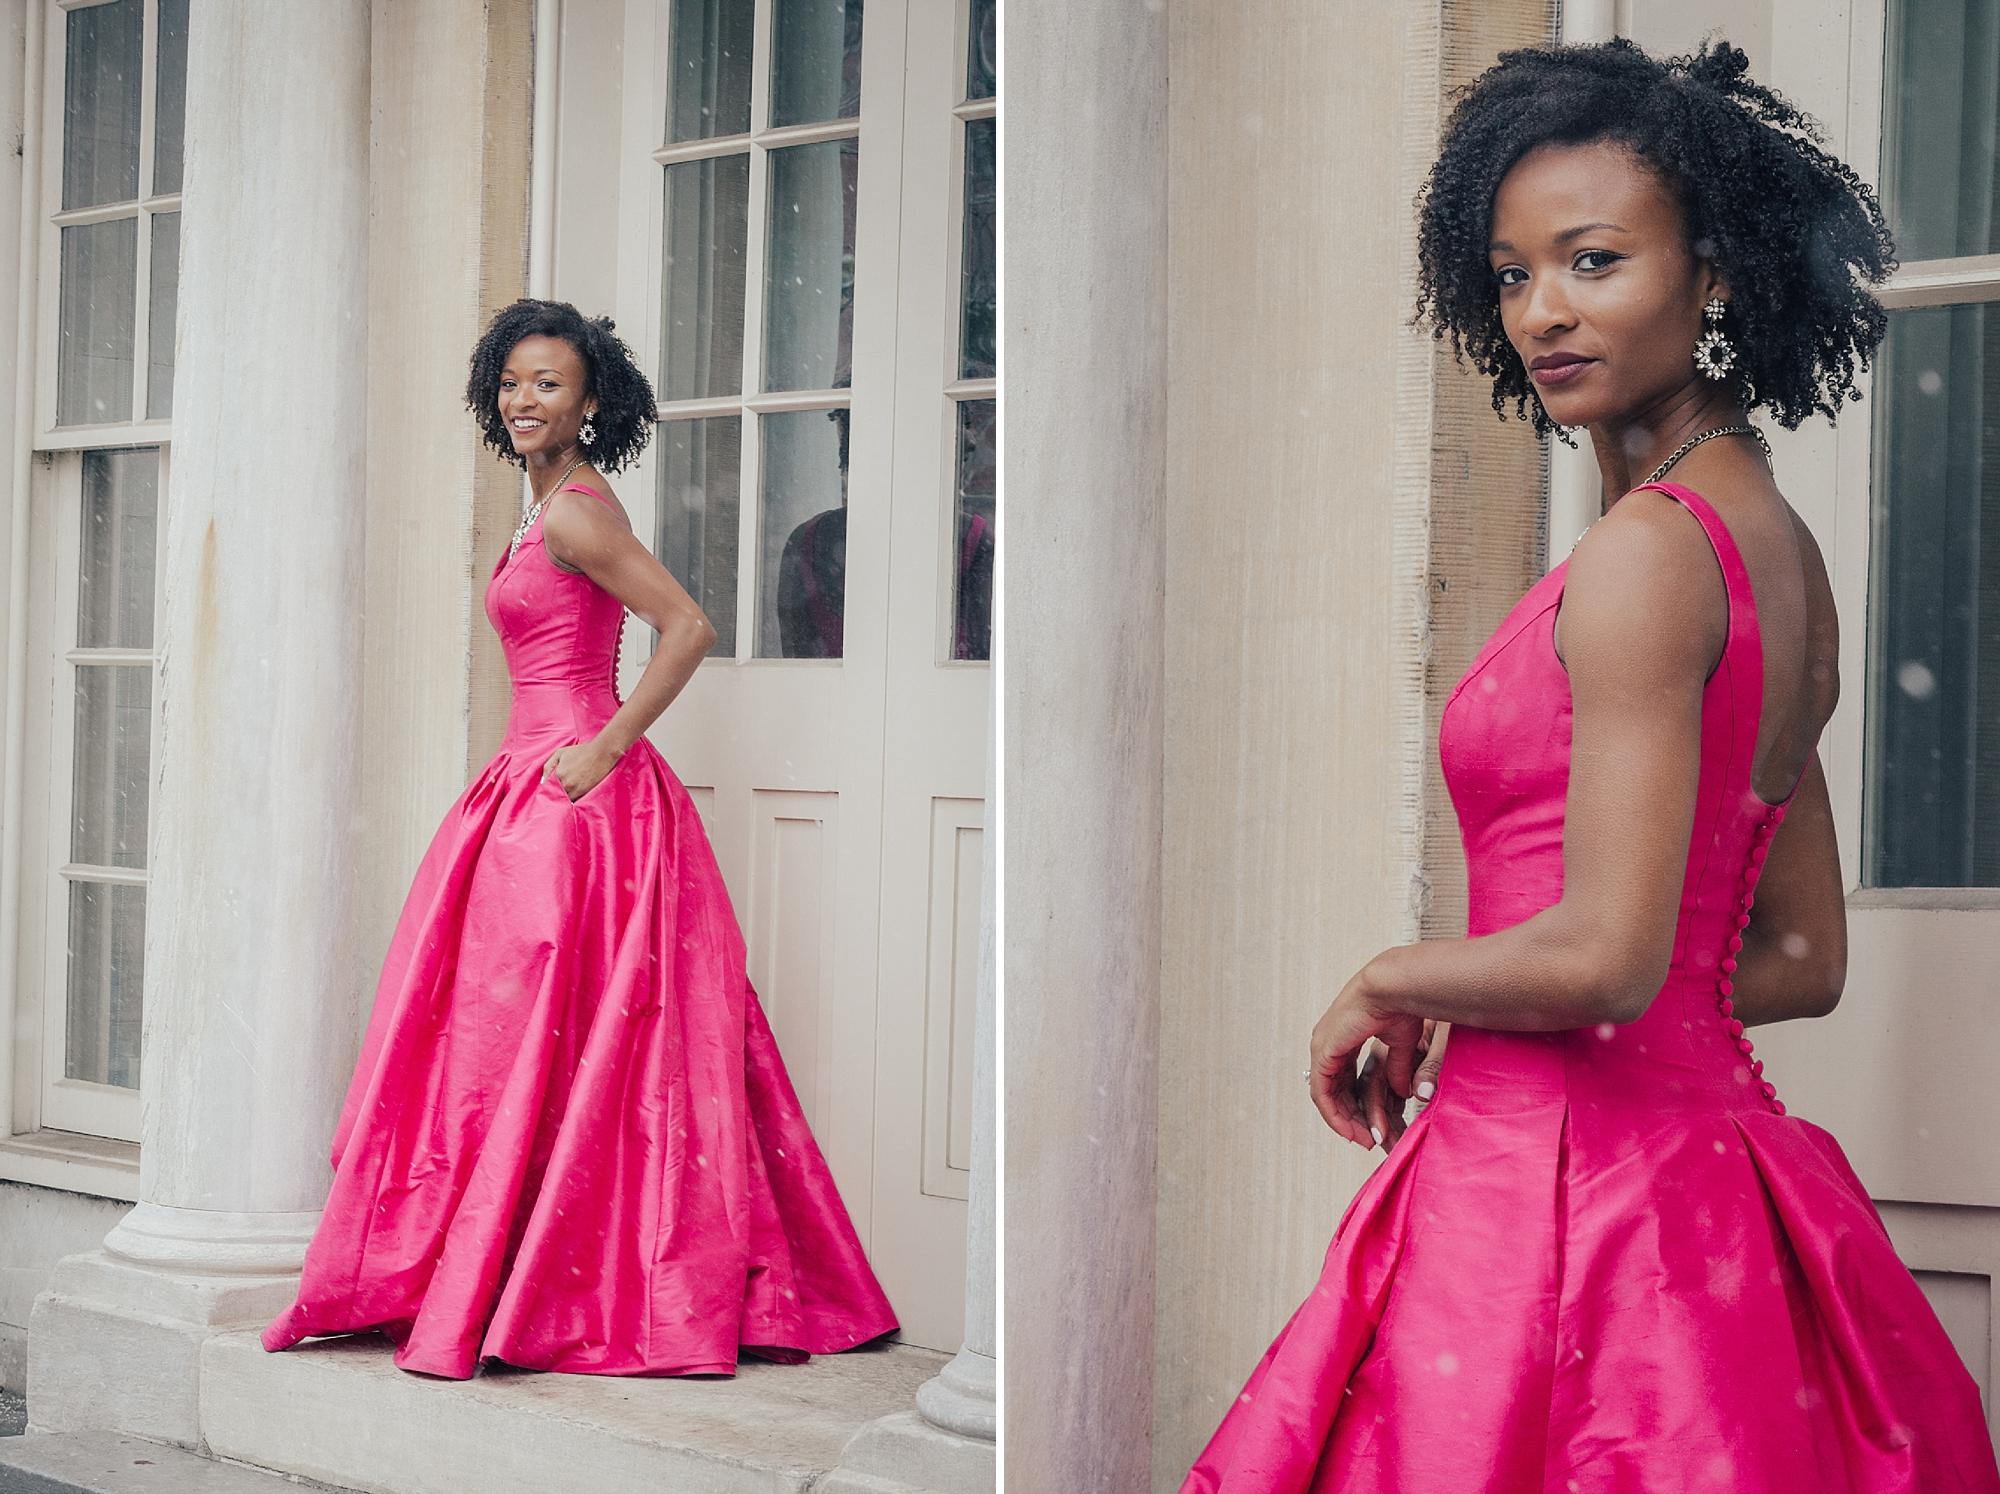 Joe_Mac_Creative_Vida_Fashionista_BHLDN_Bridal_Wedding_Fashion__0016.jpg